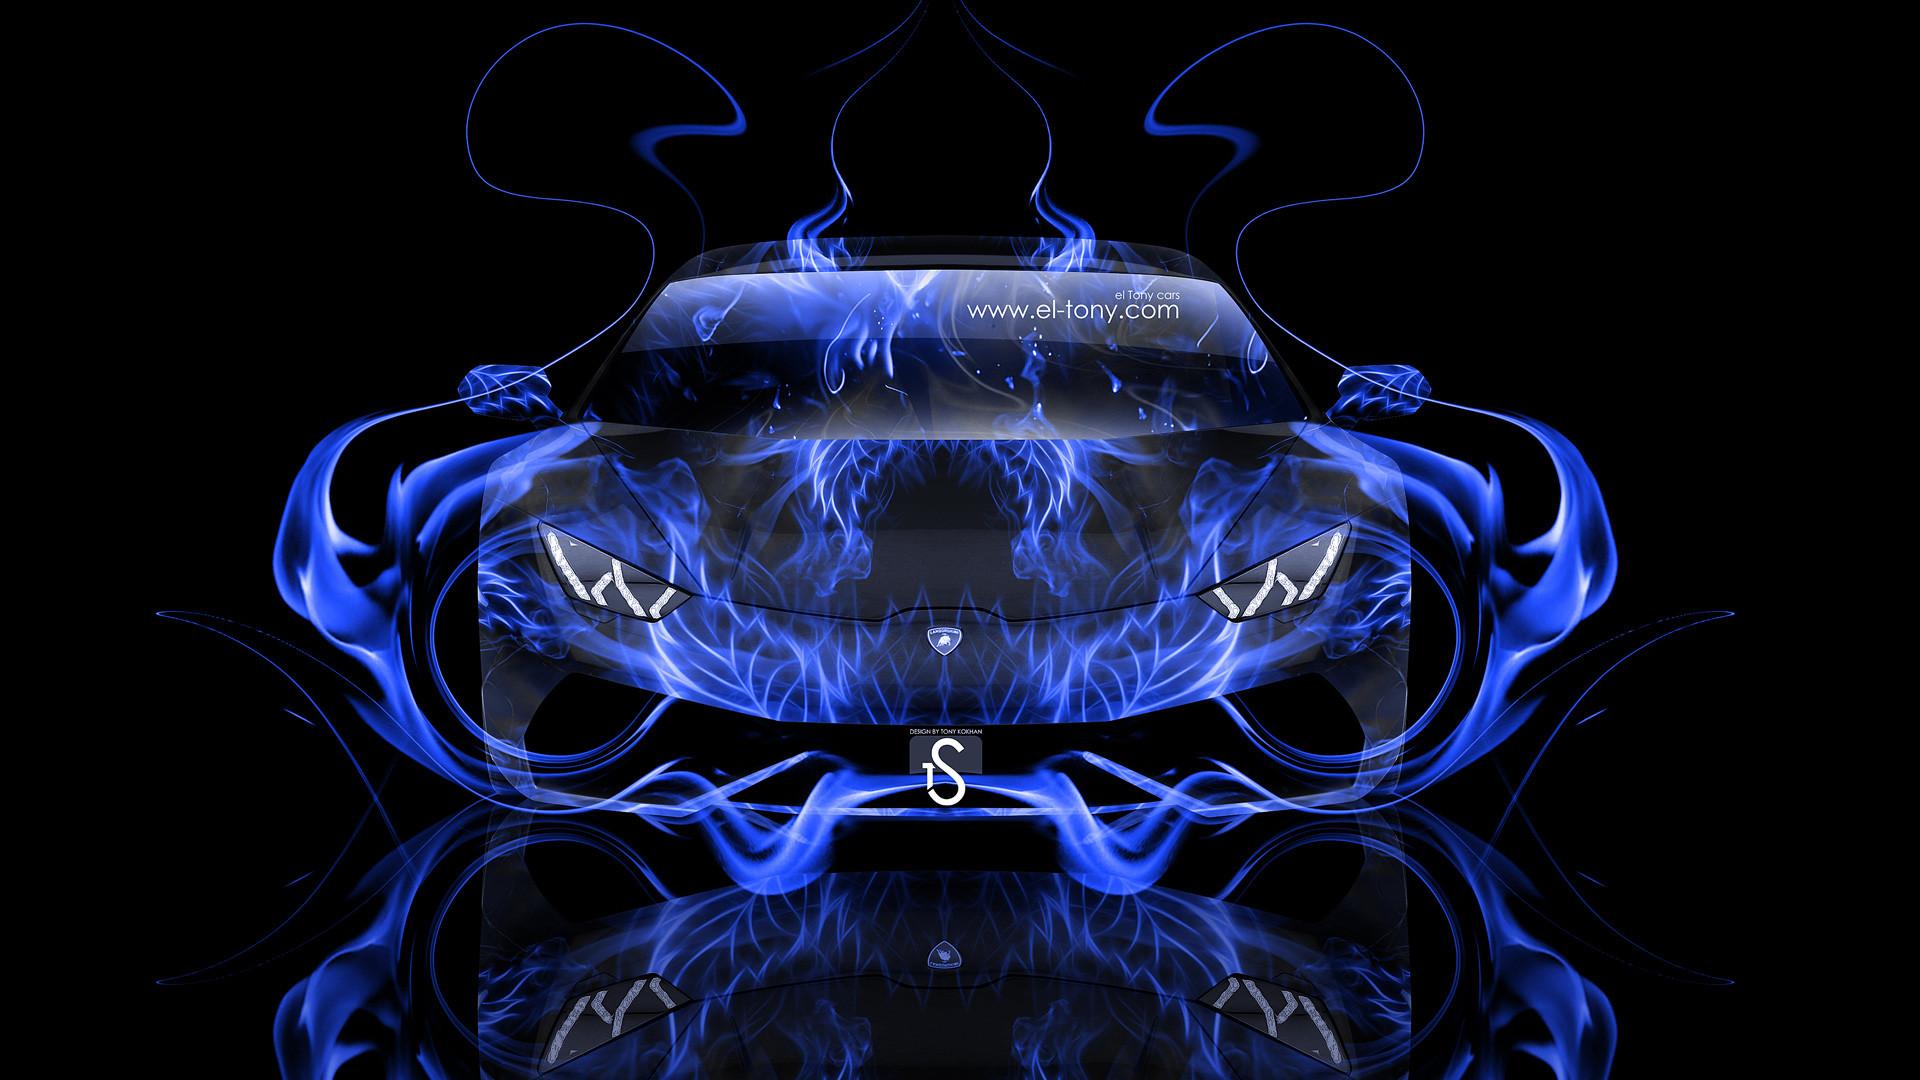 Lamborghini-Huracan-Front-Blue-Fire-Abstract-Car-2014-HD .